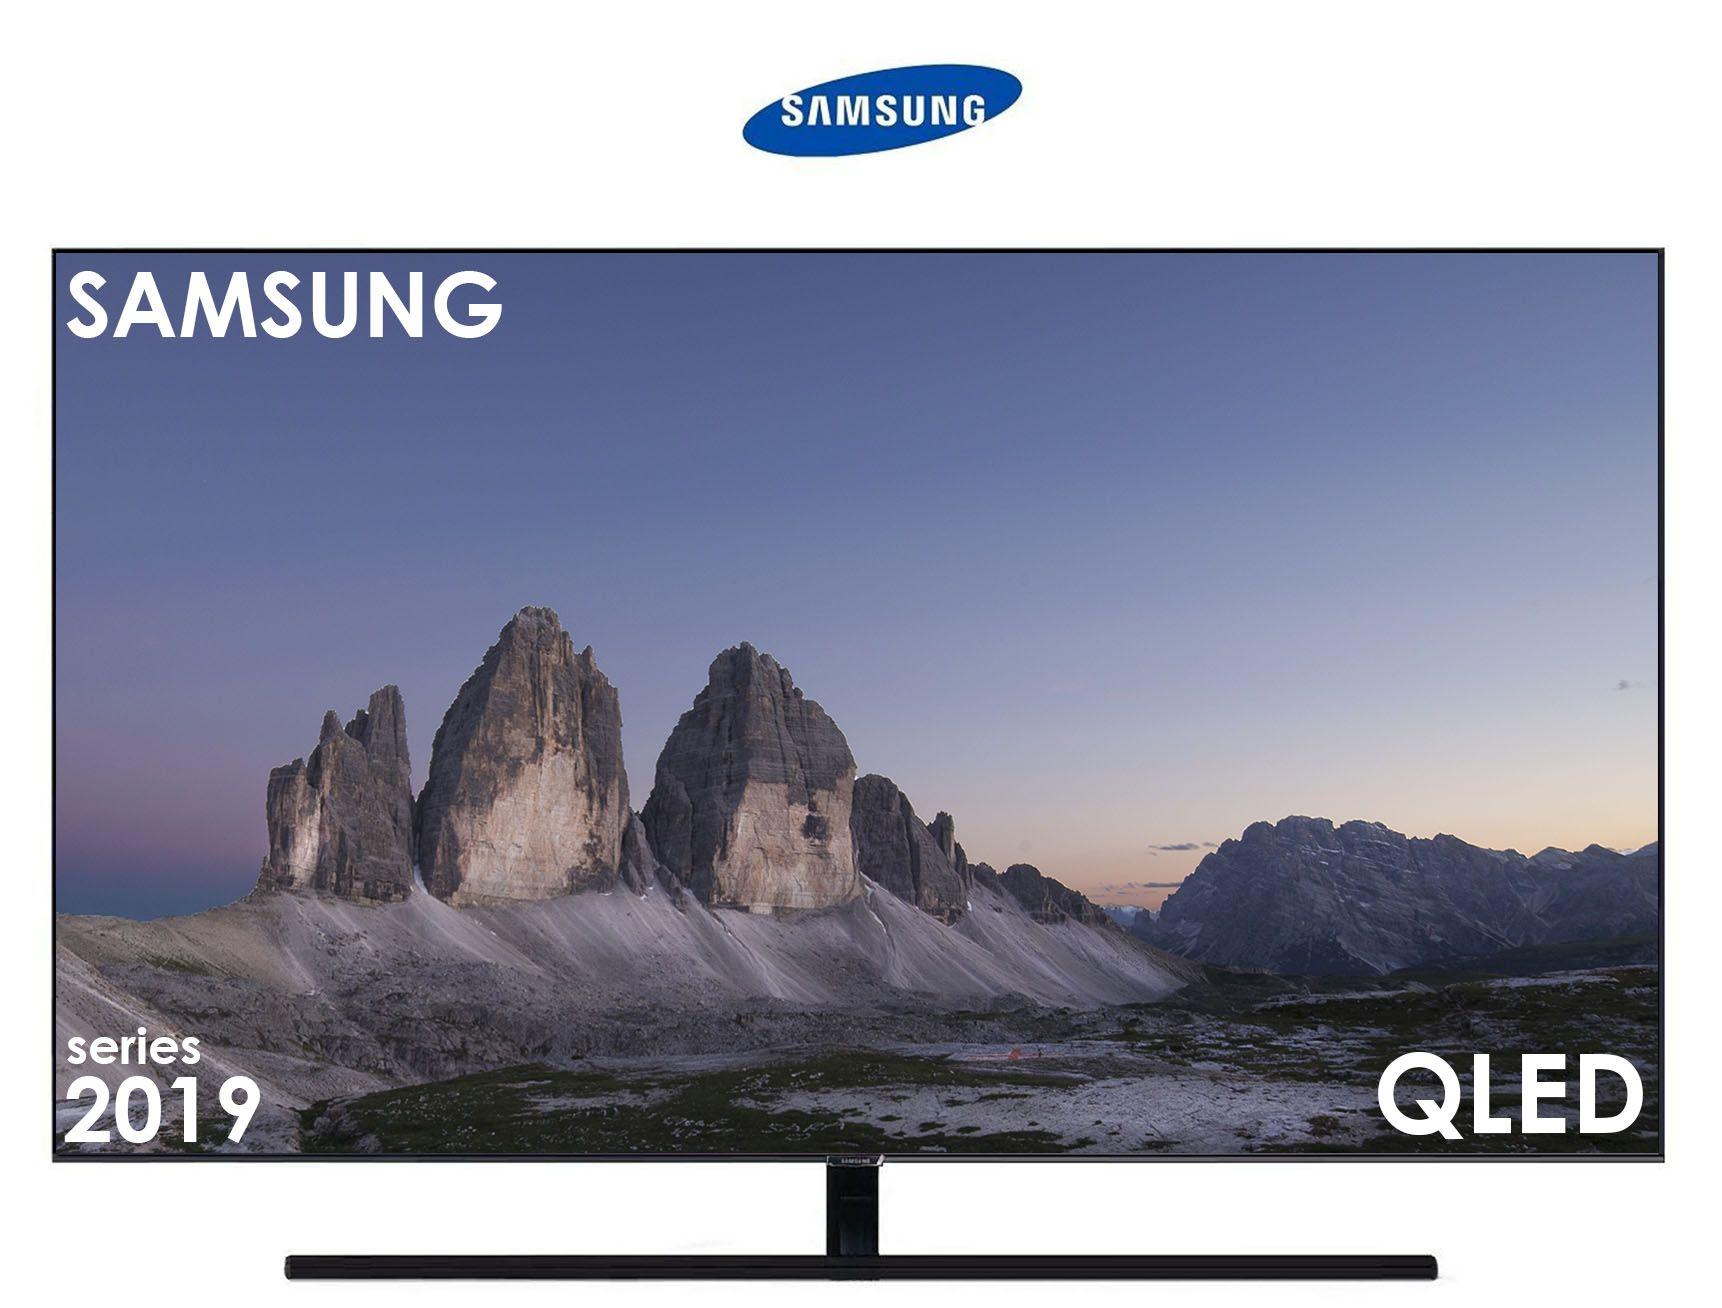 Samsung QLED Q65Q80R 65 Zoll 4K UHD Smart TV 12046 3